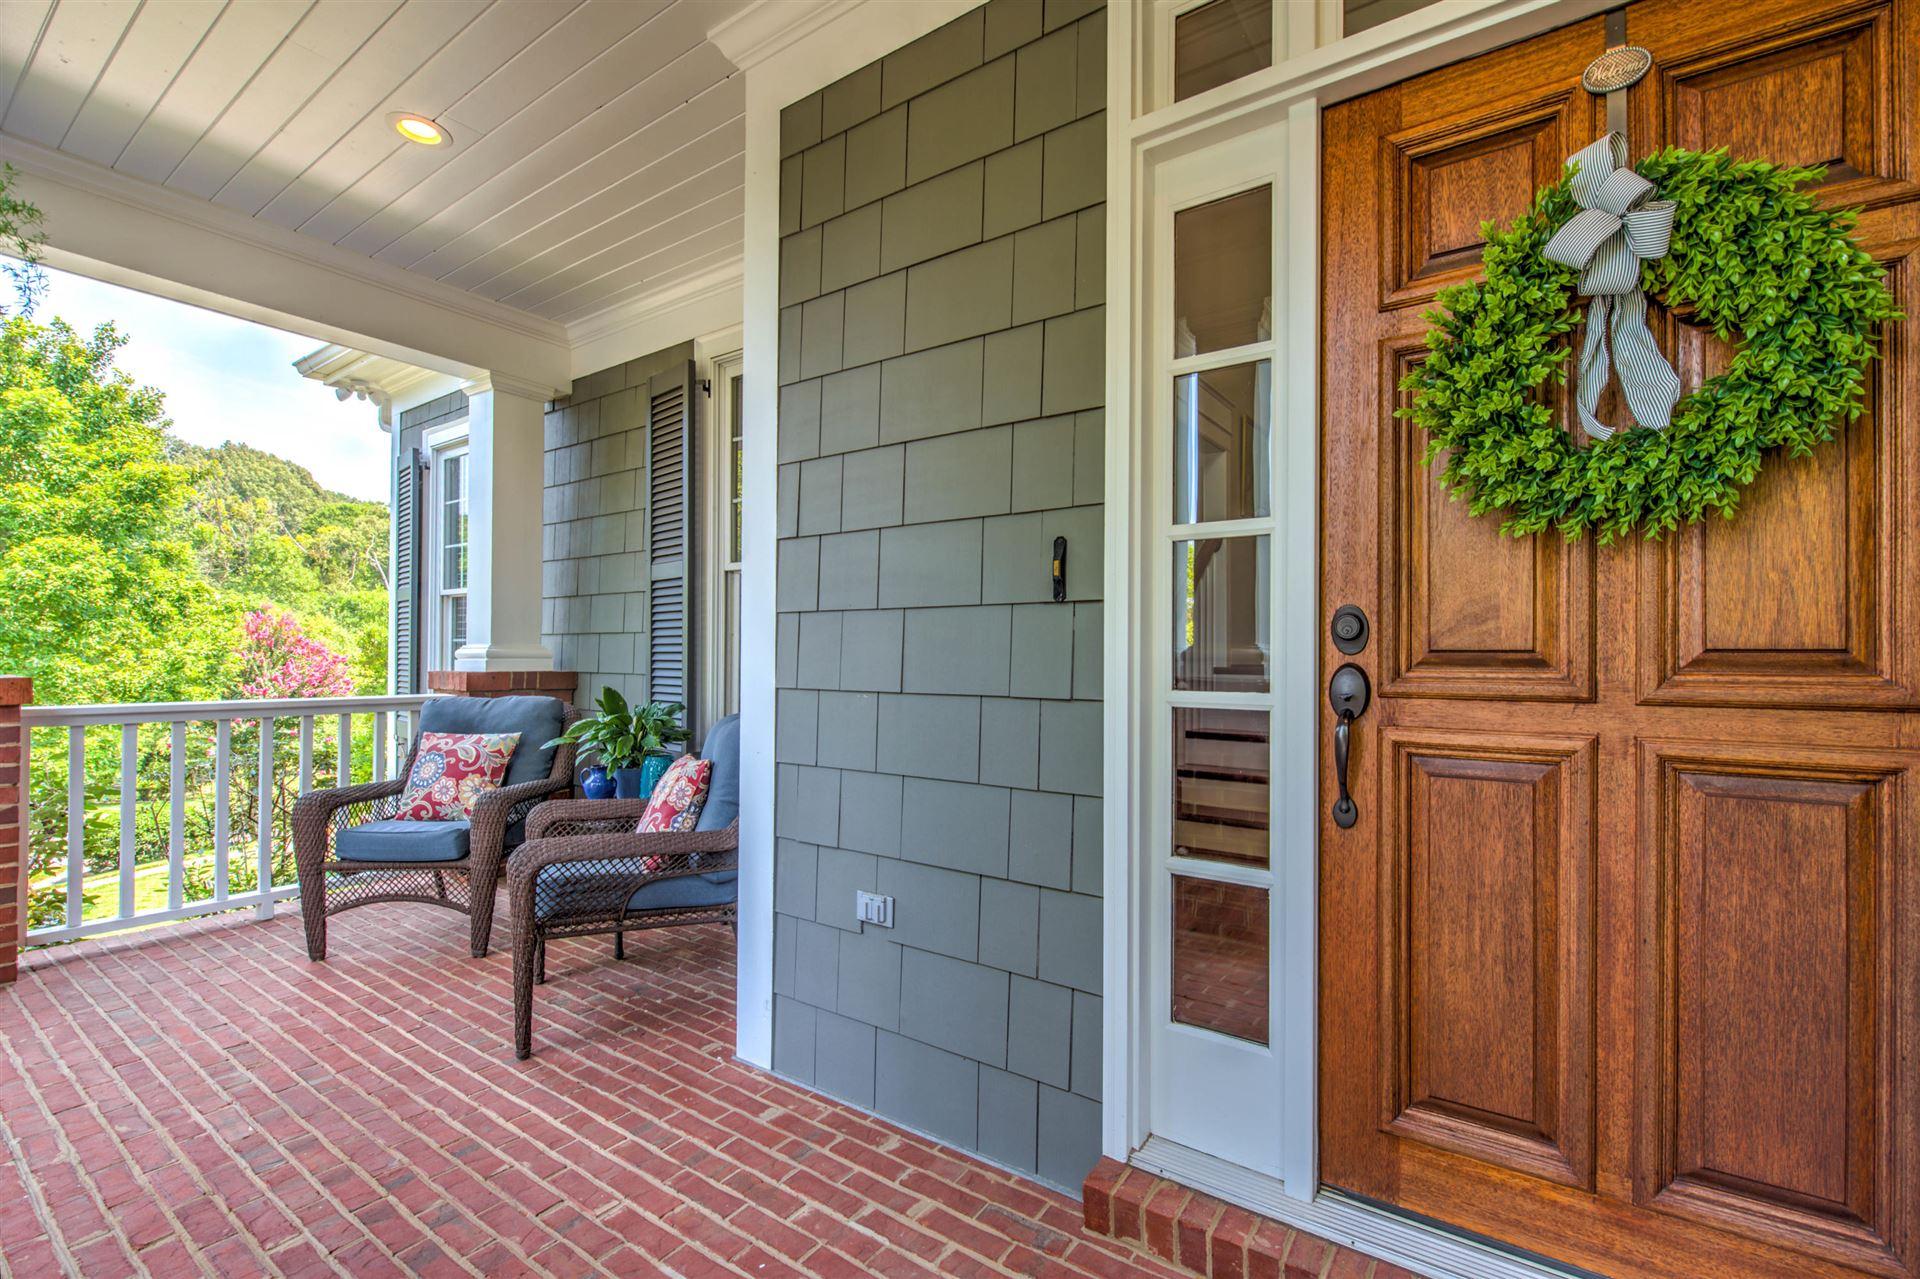 Photo of 11514 Cottage Creek Lane, Knoxville, TN 37934 (MLS # 1162160)